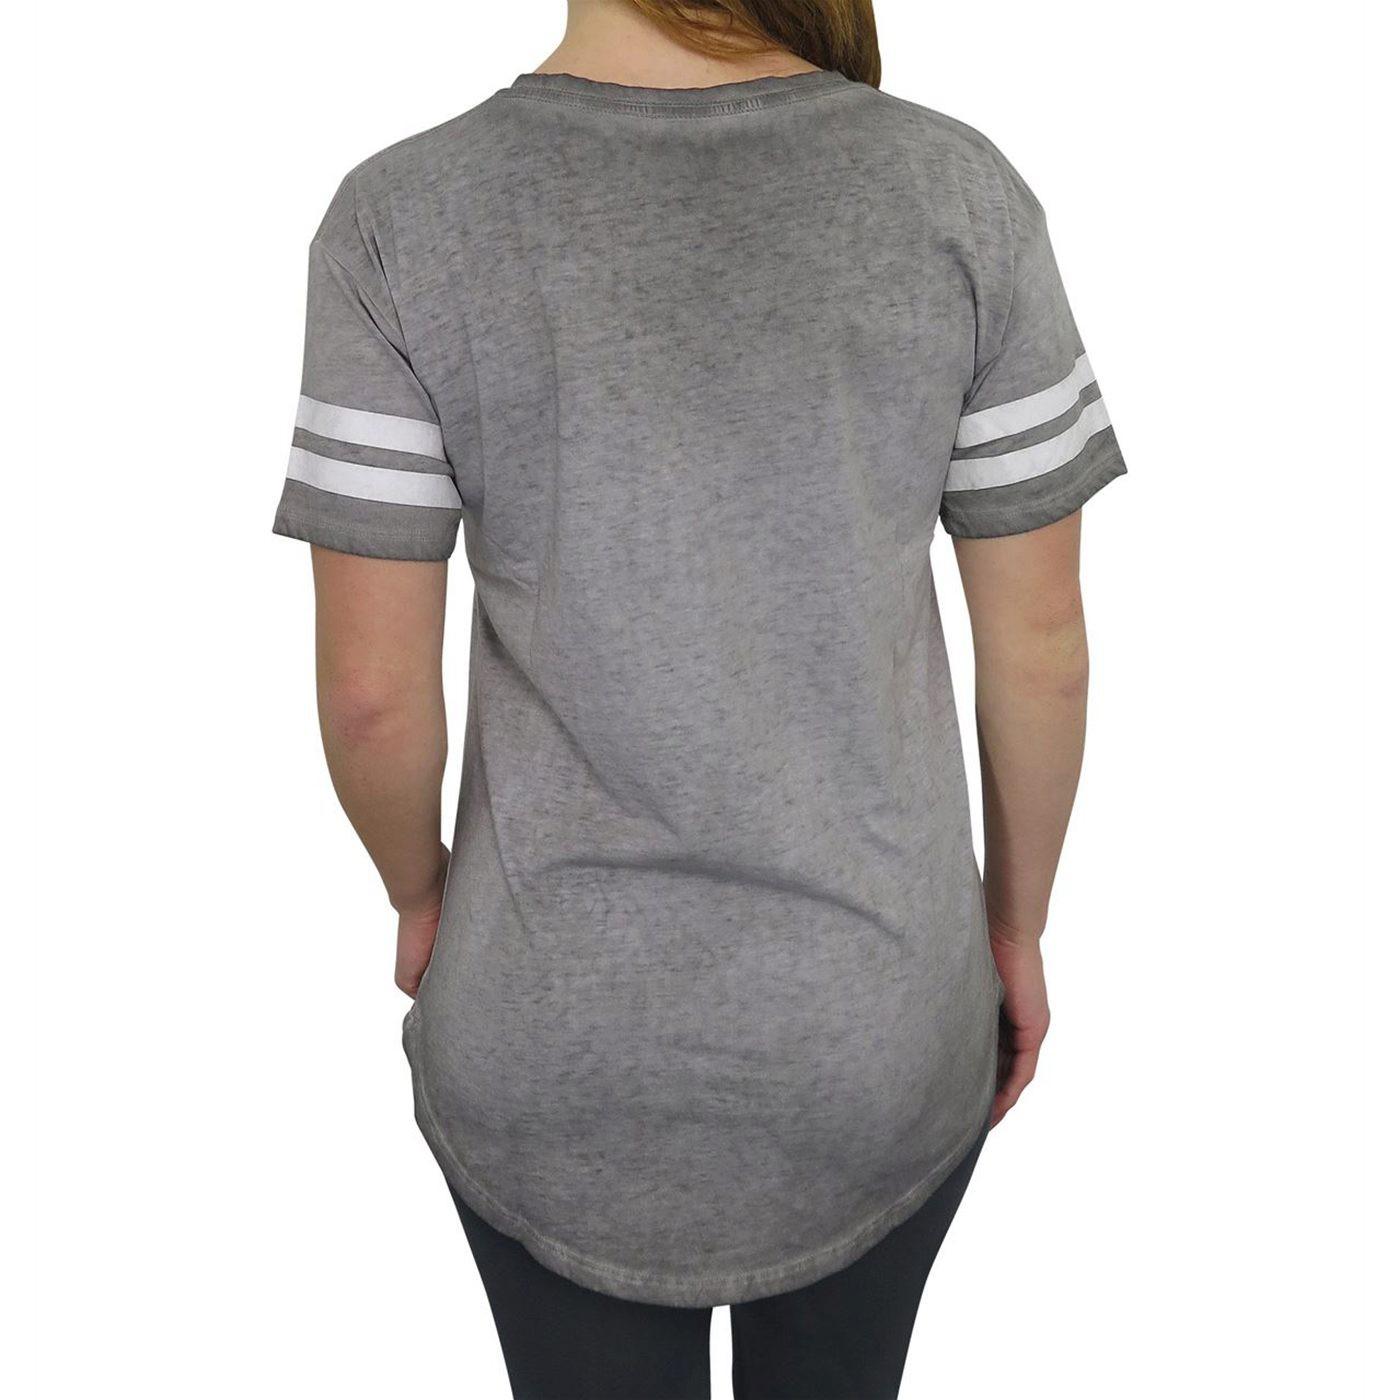 Spider-Man Athletic Women's Burnout V-Neck T-Shirt